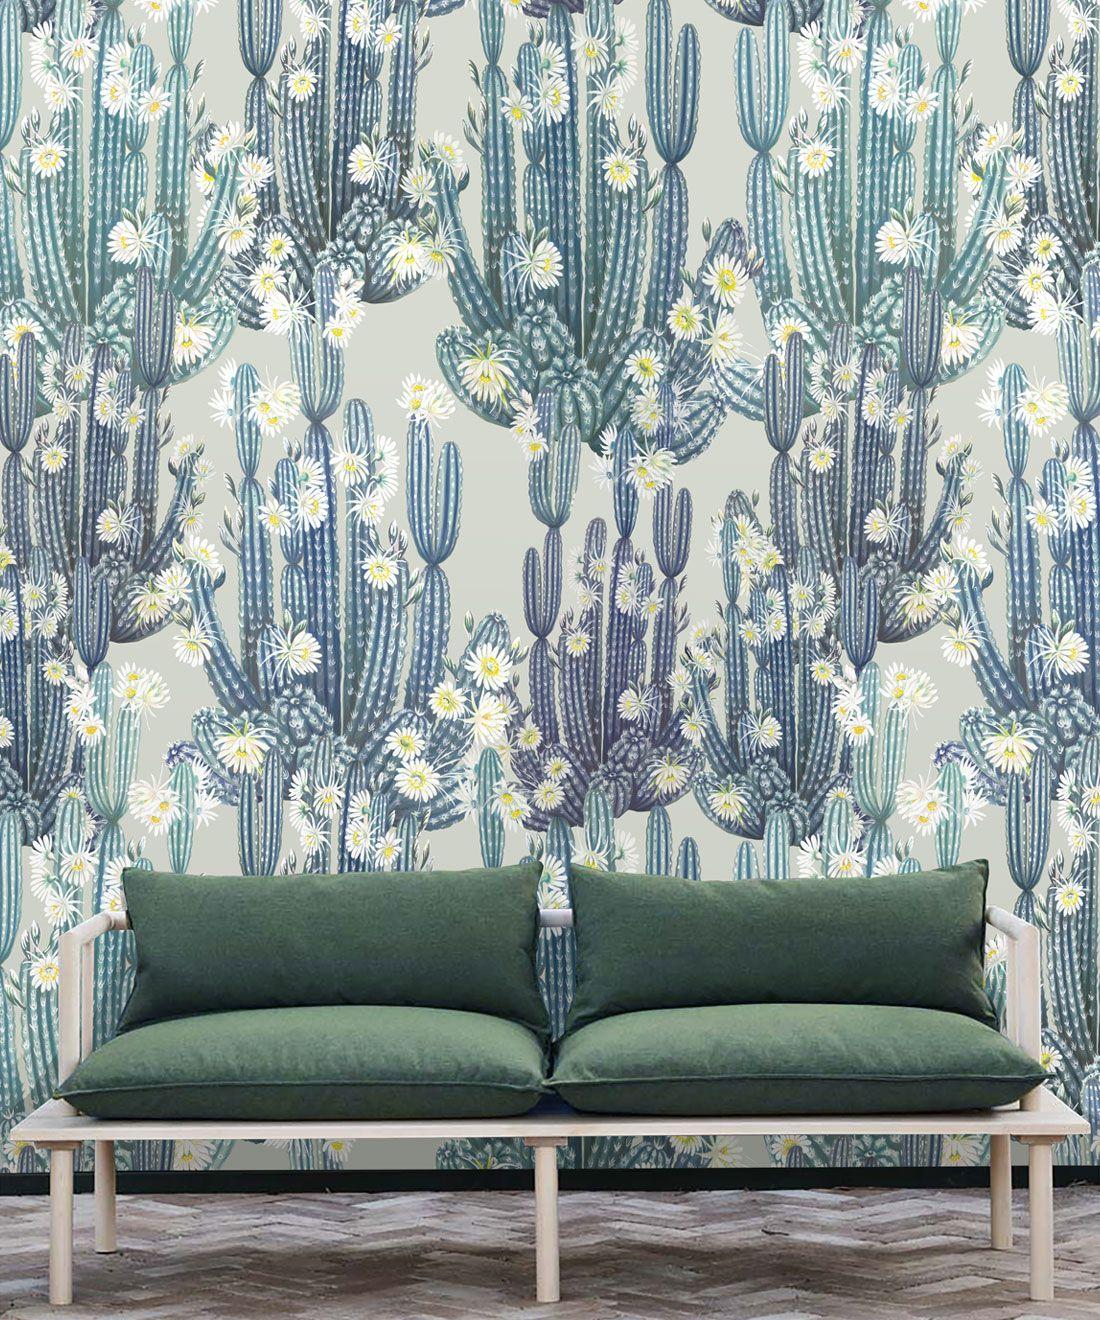 San Pedro Wallpaper Blue • Cactus Wallpaper • Succulents Wallpaper • Desert Wallpaper Insitu behind couch with green cushions